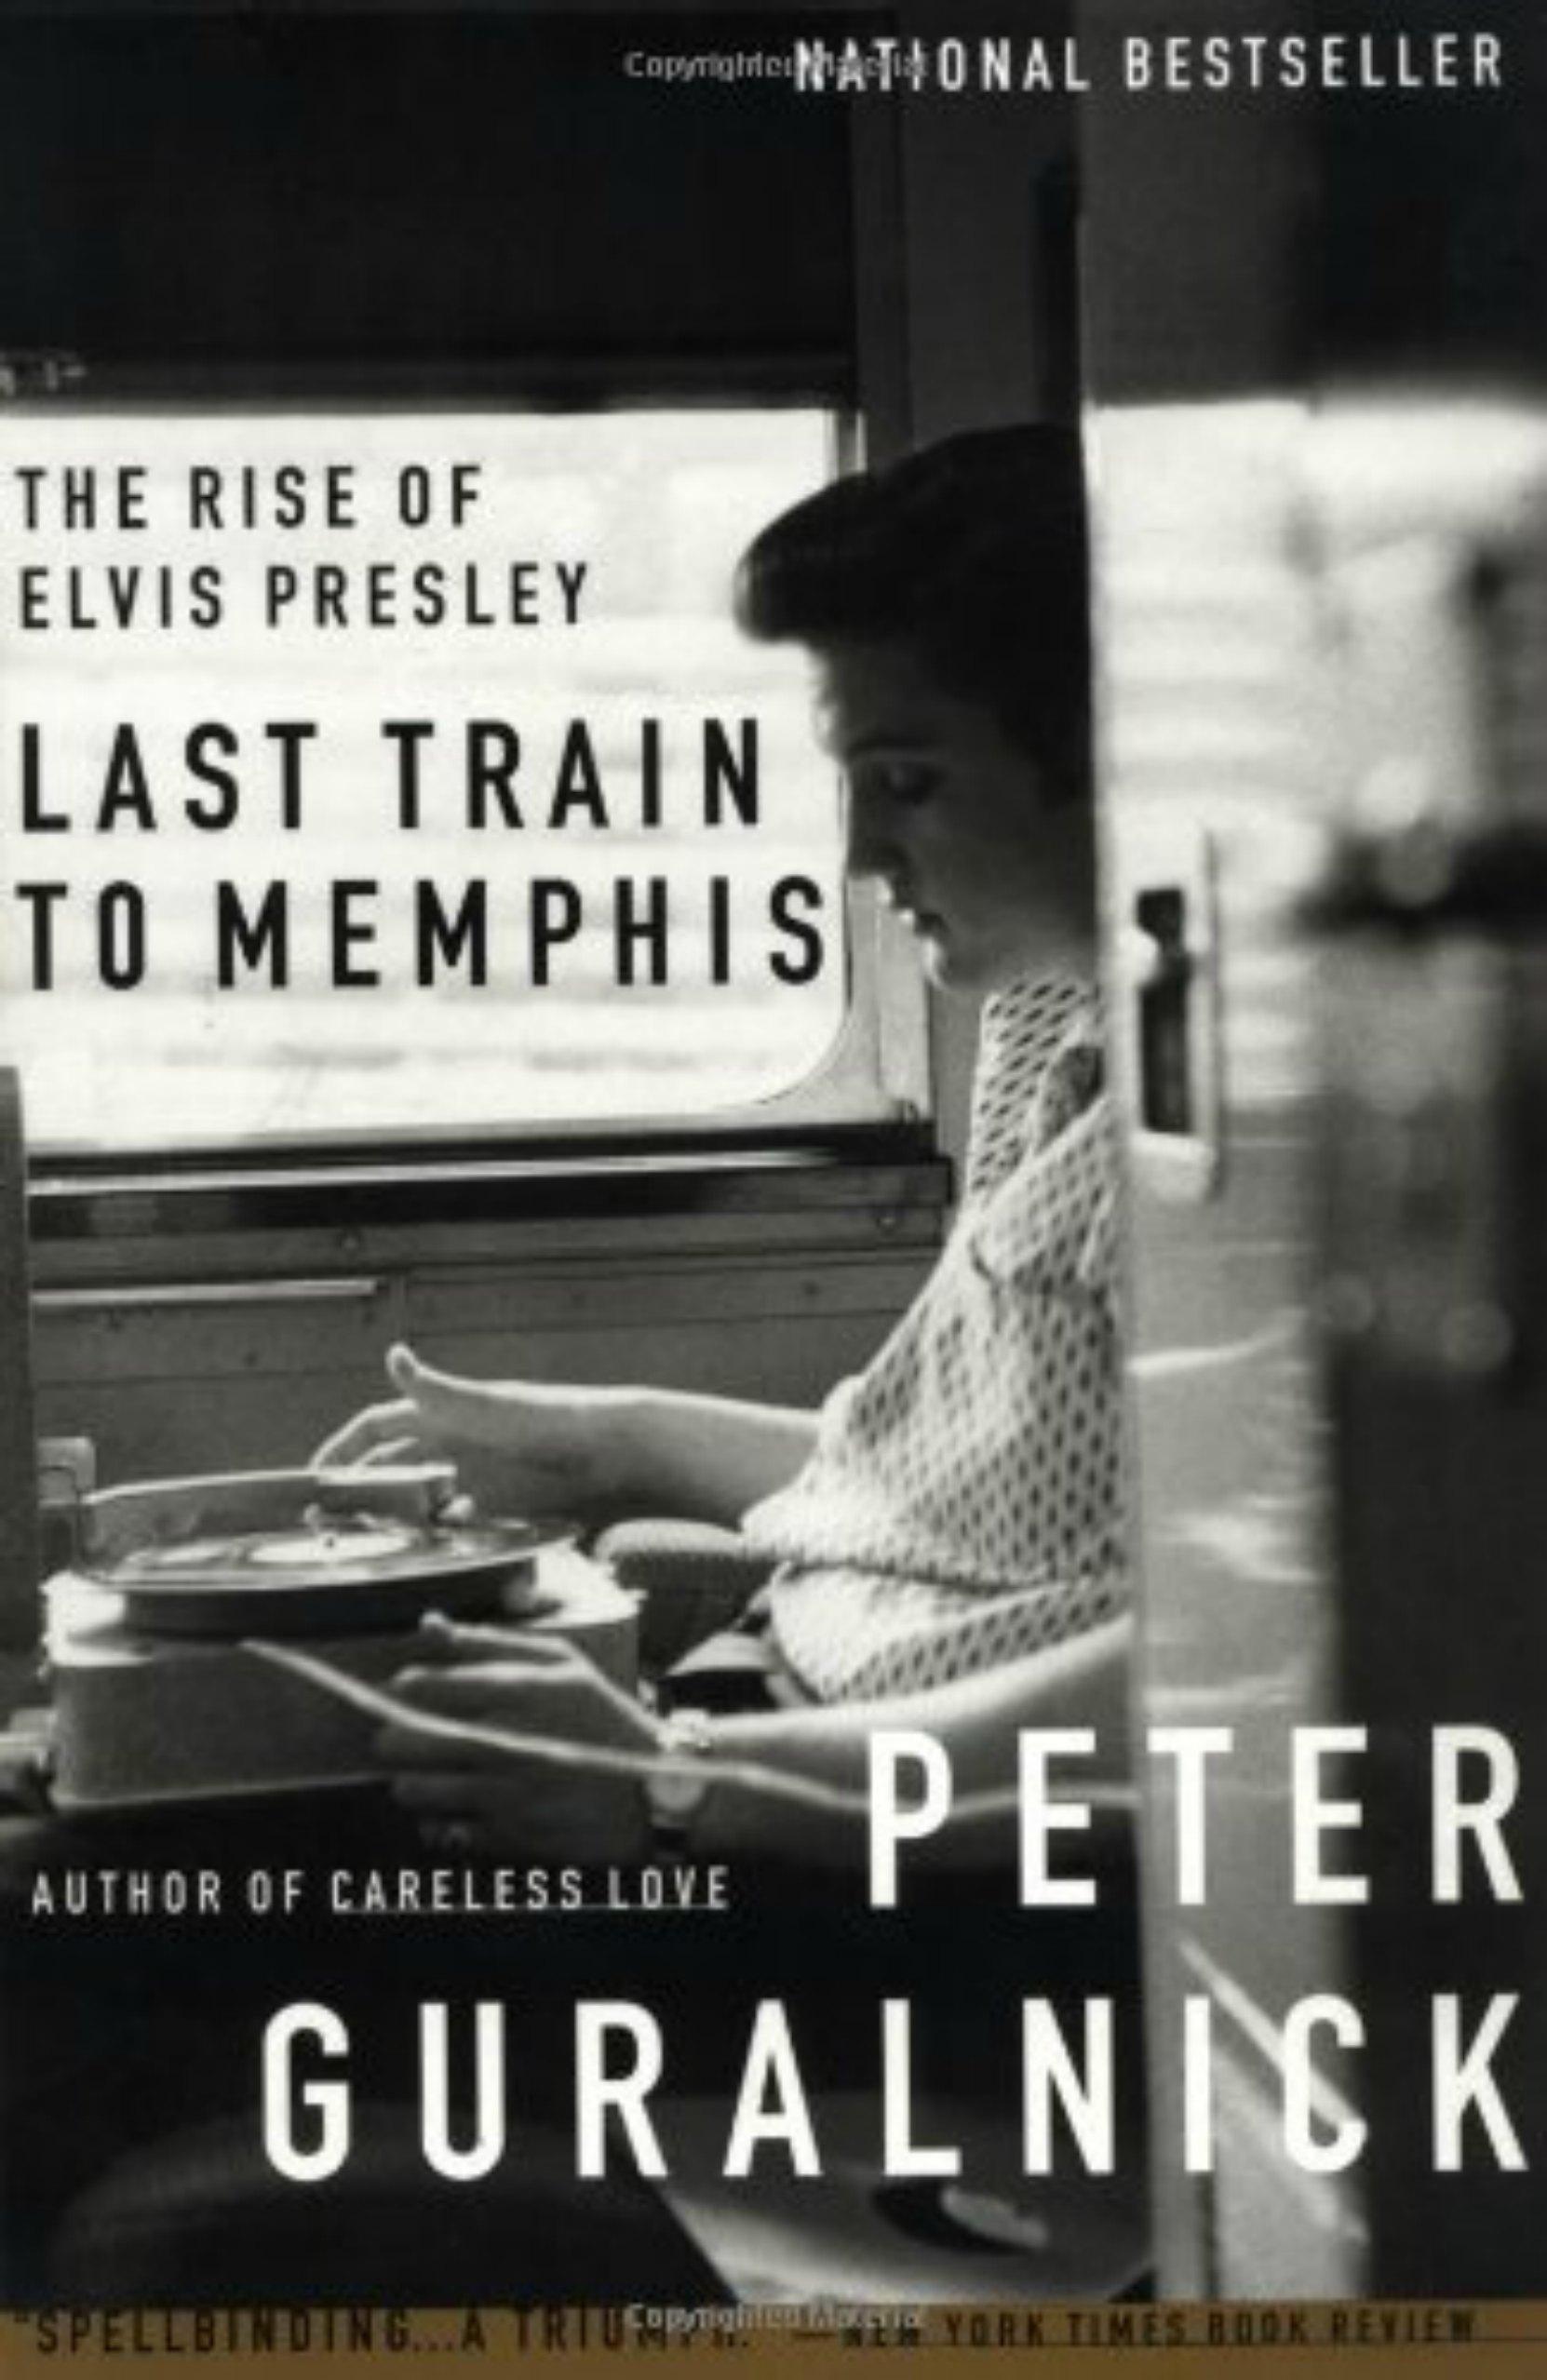 Peter Guralnick - Last Train to Memphis